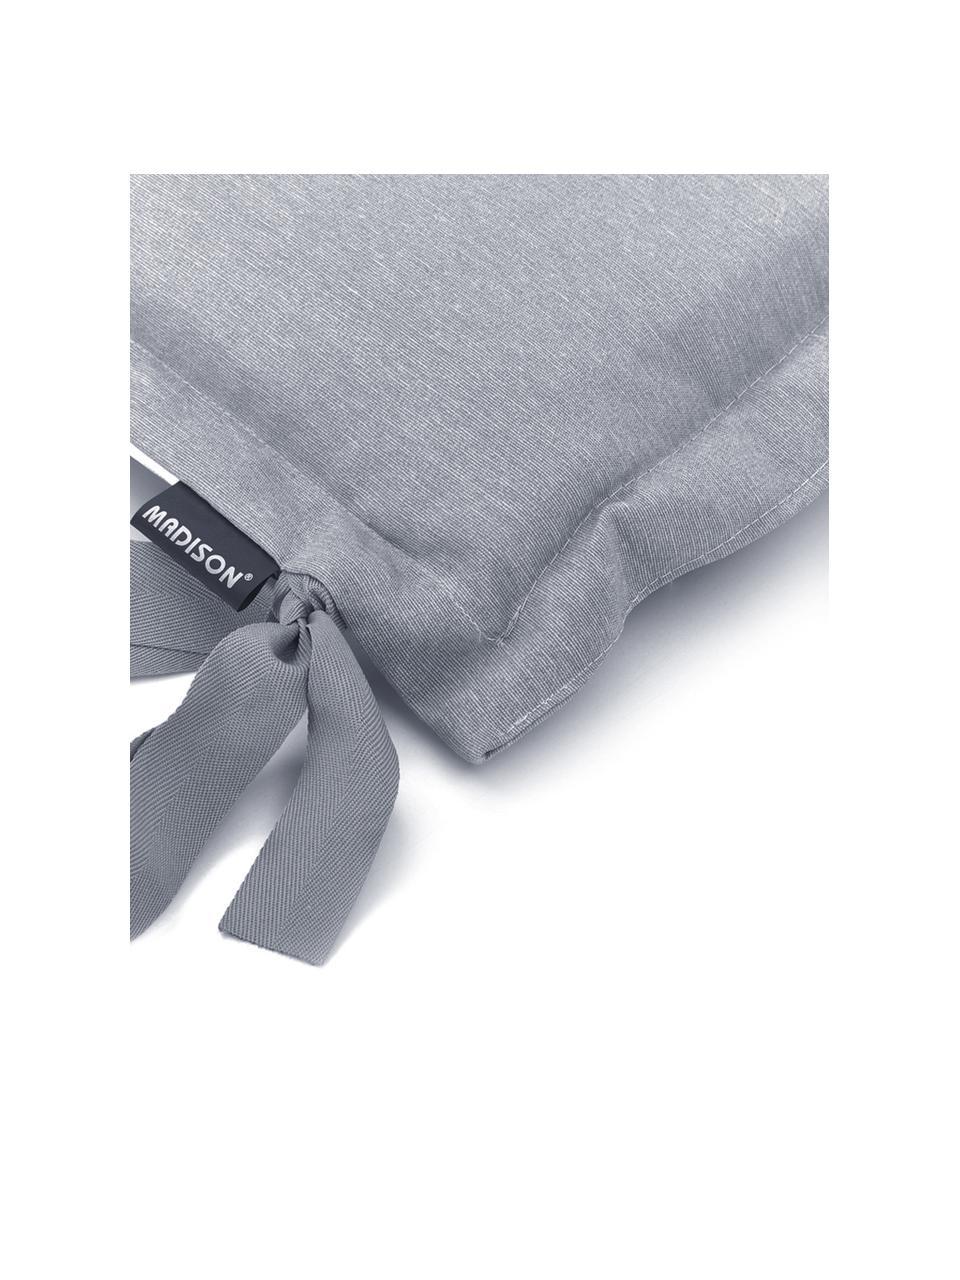 Einfarbige Bankauflage Panama in Hellgrau, 50% Baumwolle, 45% Polyester, 5% andere Fasern, Hellgrau, 48 x 120 cm